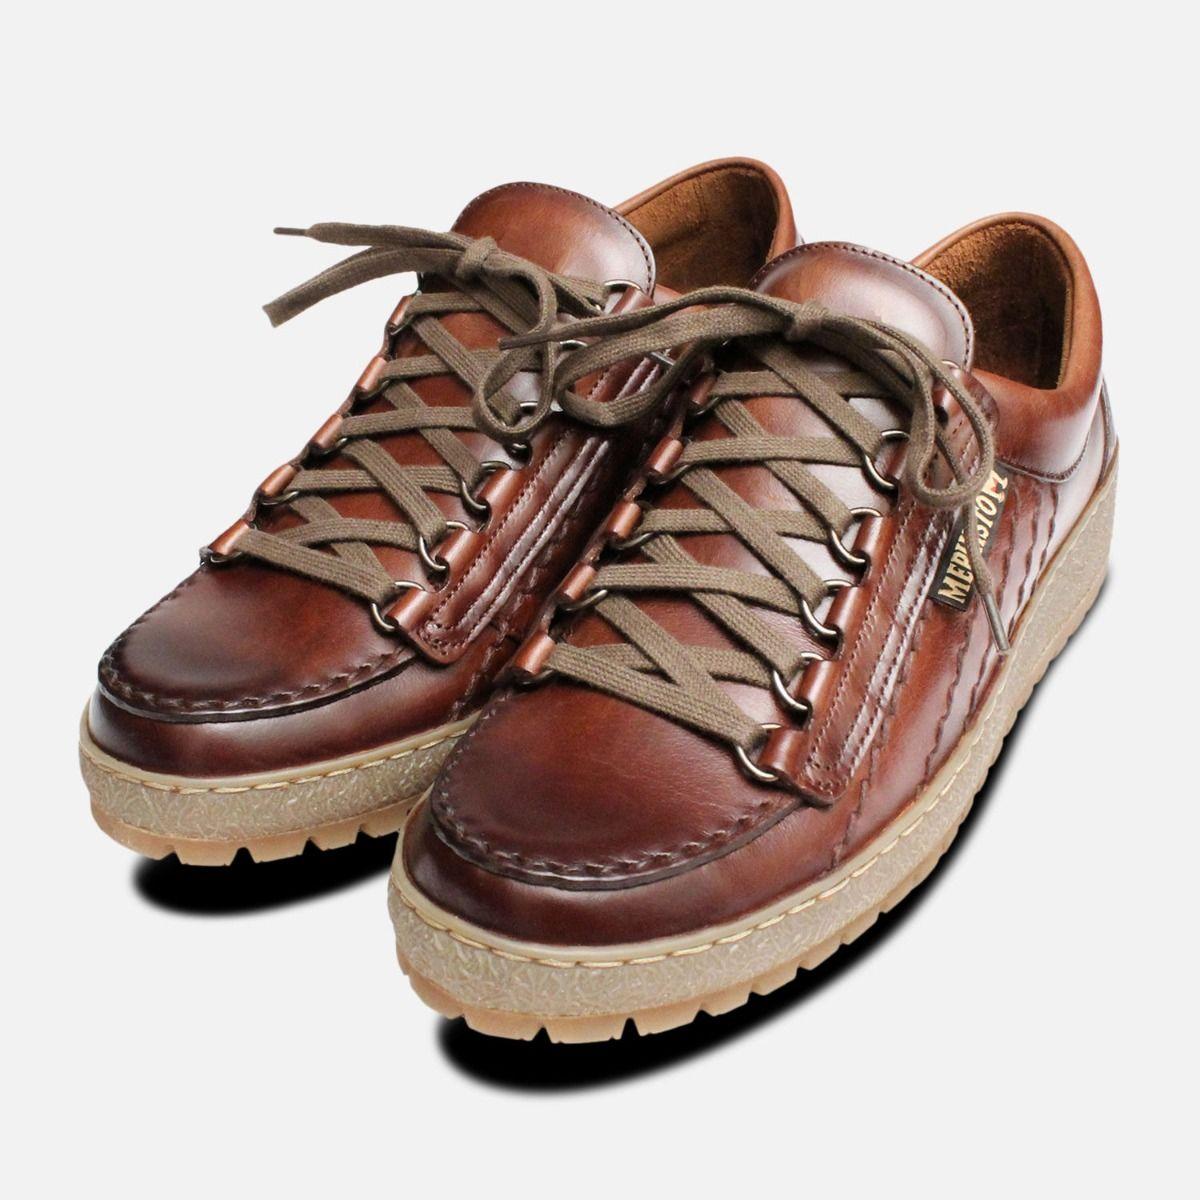 Waxy Chestnut Rainbow Mephisto Shoes